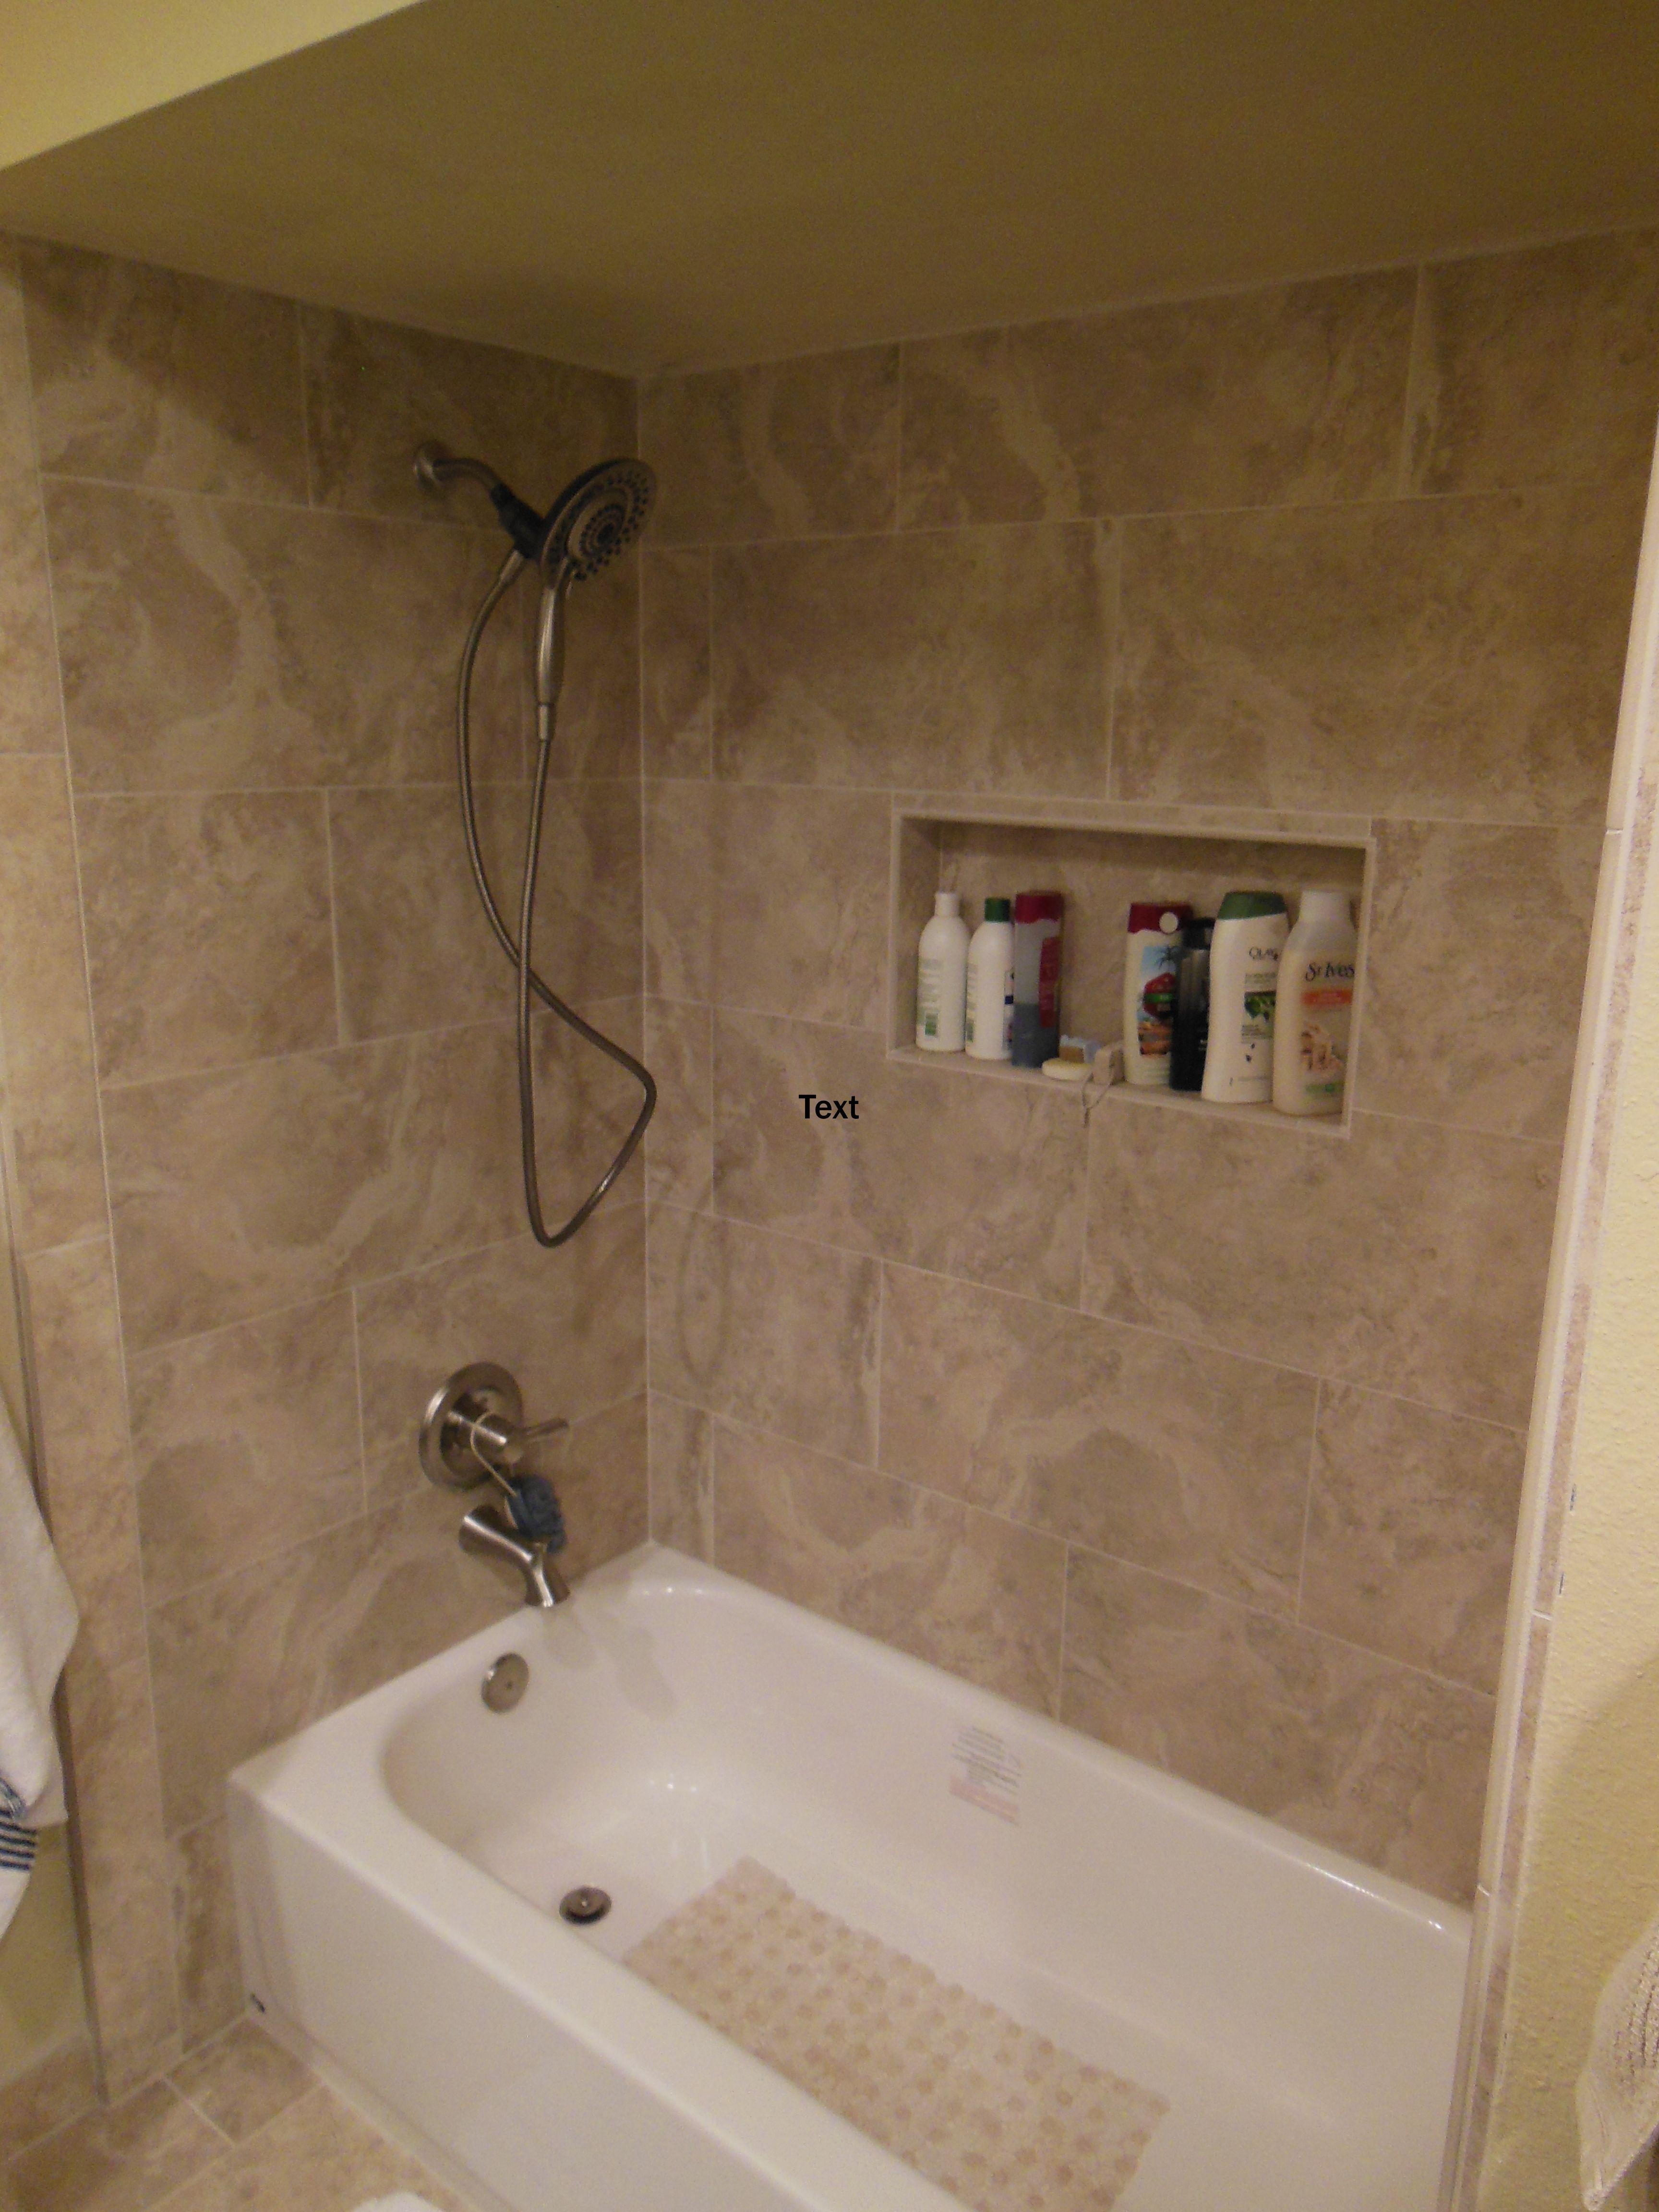 pin by joshua glenn tile contractor on tub enclosures by joshua glenn tile contractor tub enclosures tub bathtub